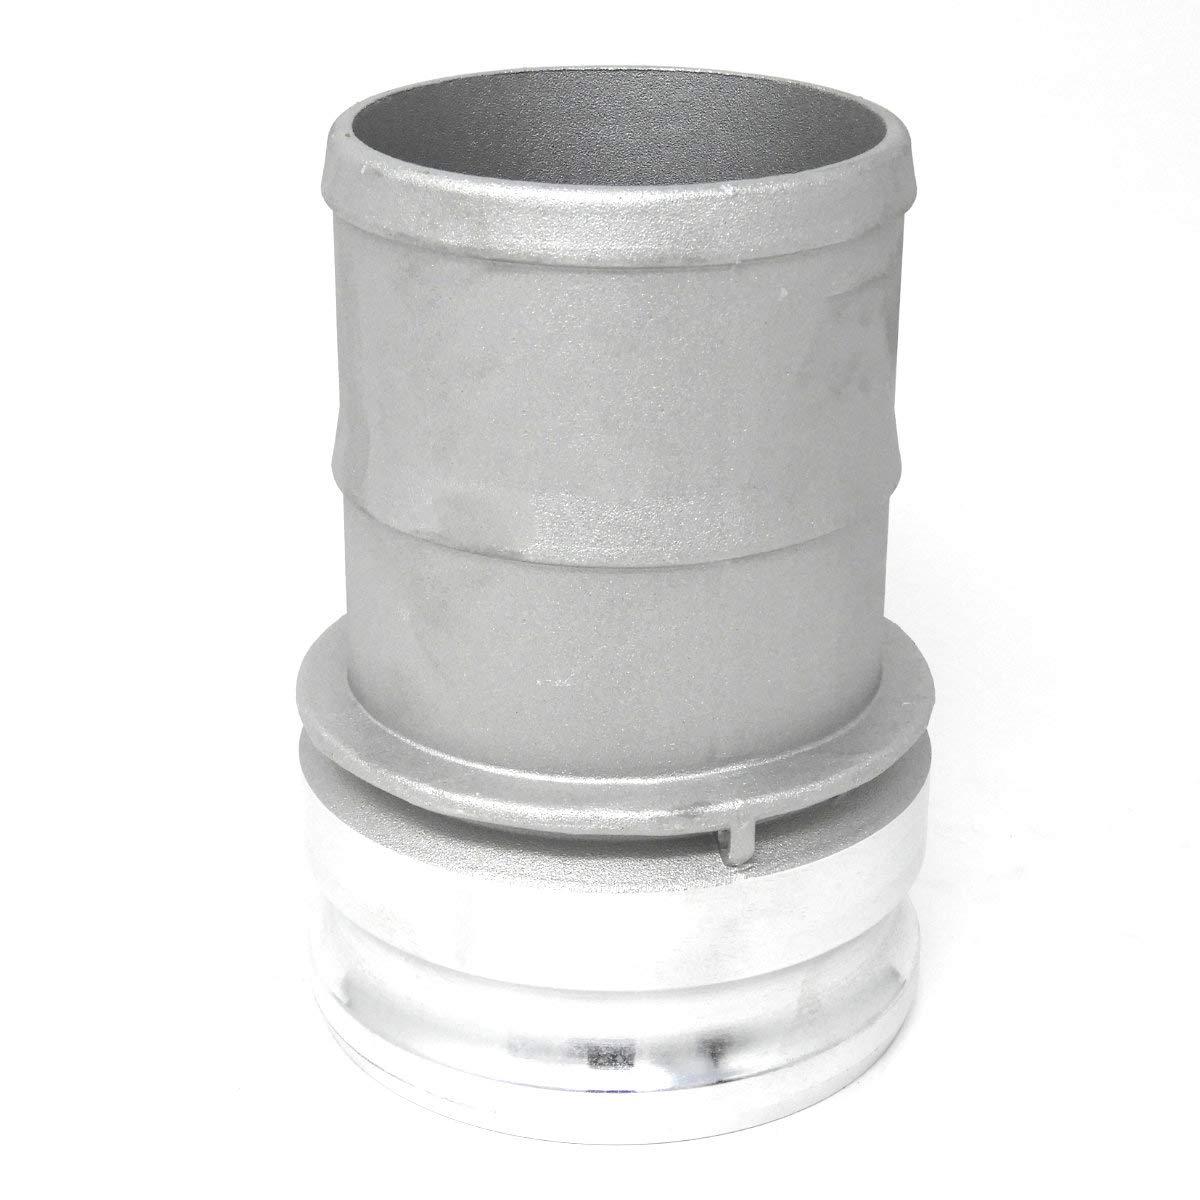 Gloxco Aluminum Type E Cam and Groove Hose Fitting CAM-30-E-AL 3/″ Male Camlock x 3/″ Hose Shank